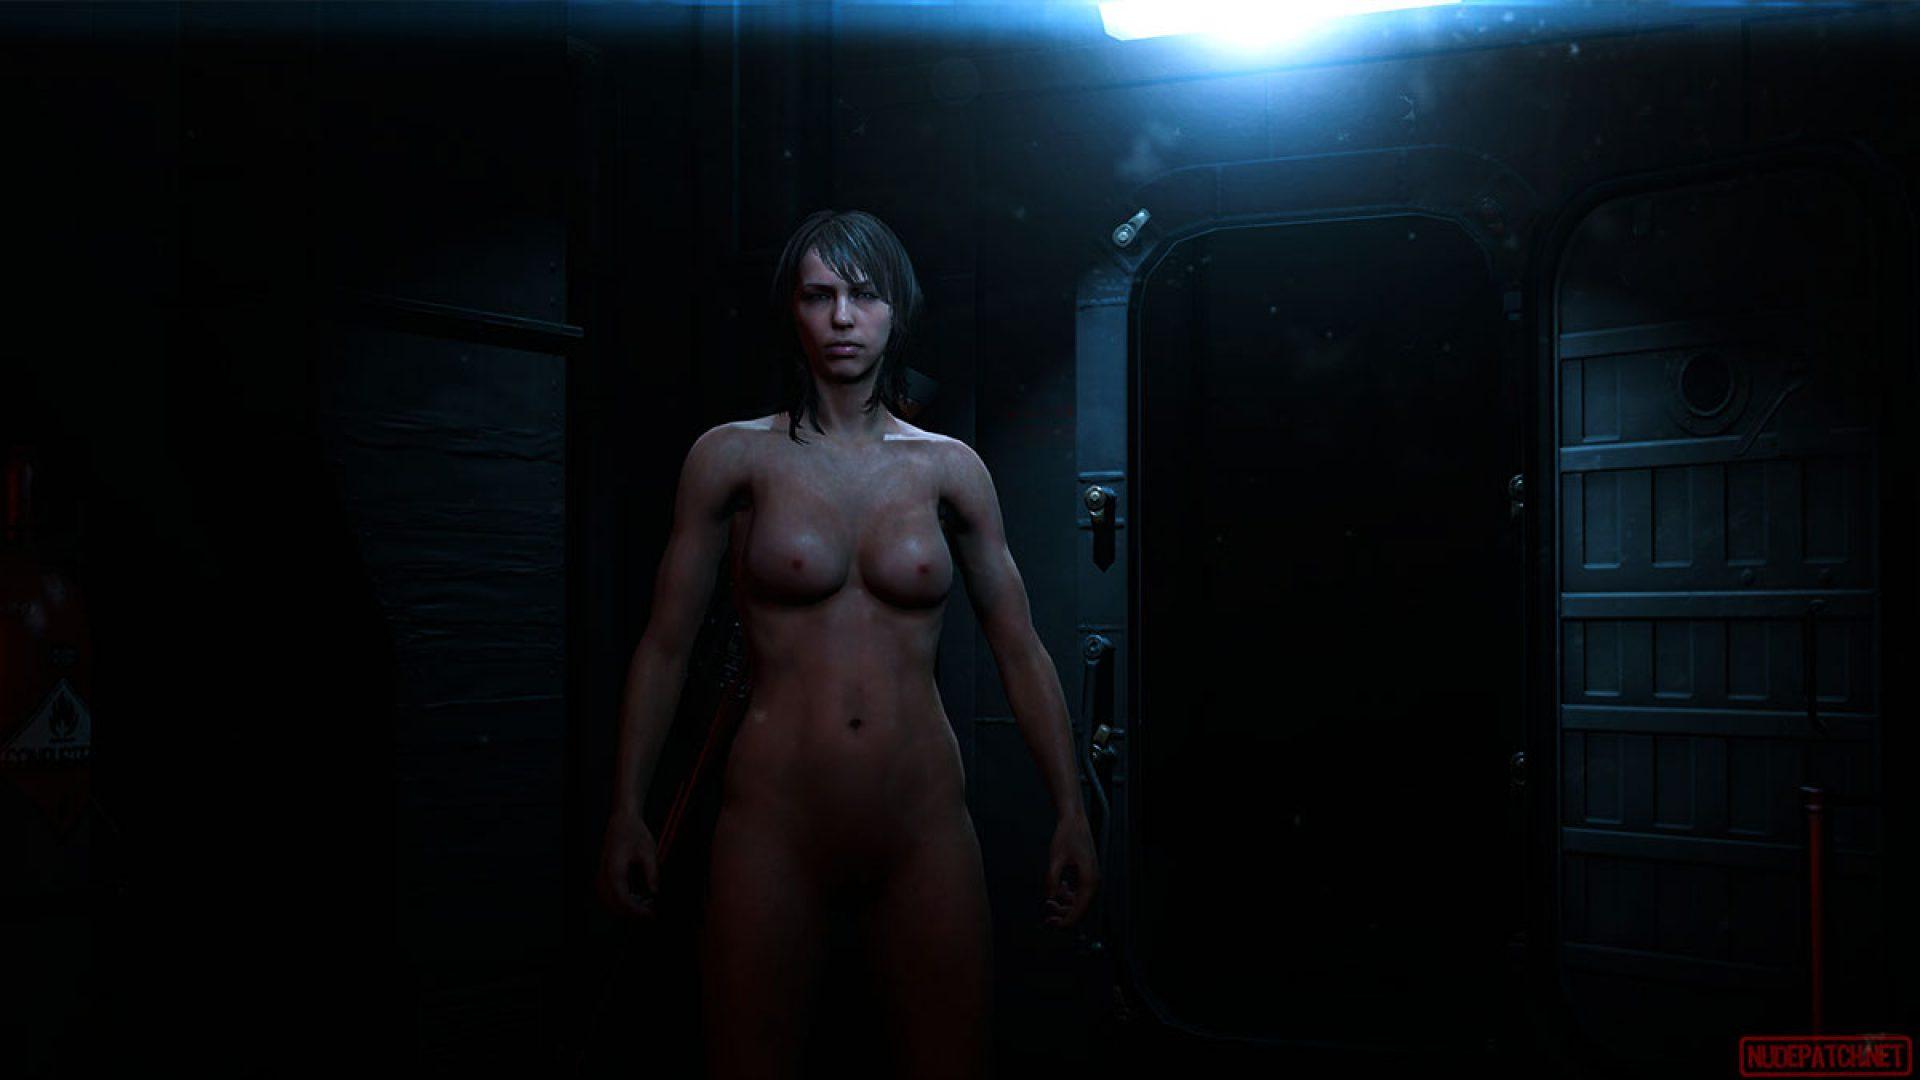 Naked quiet Quiet Pics